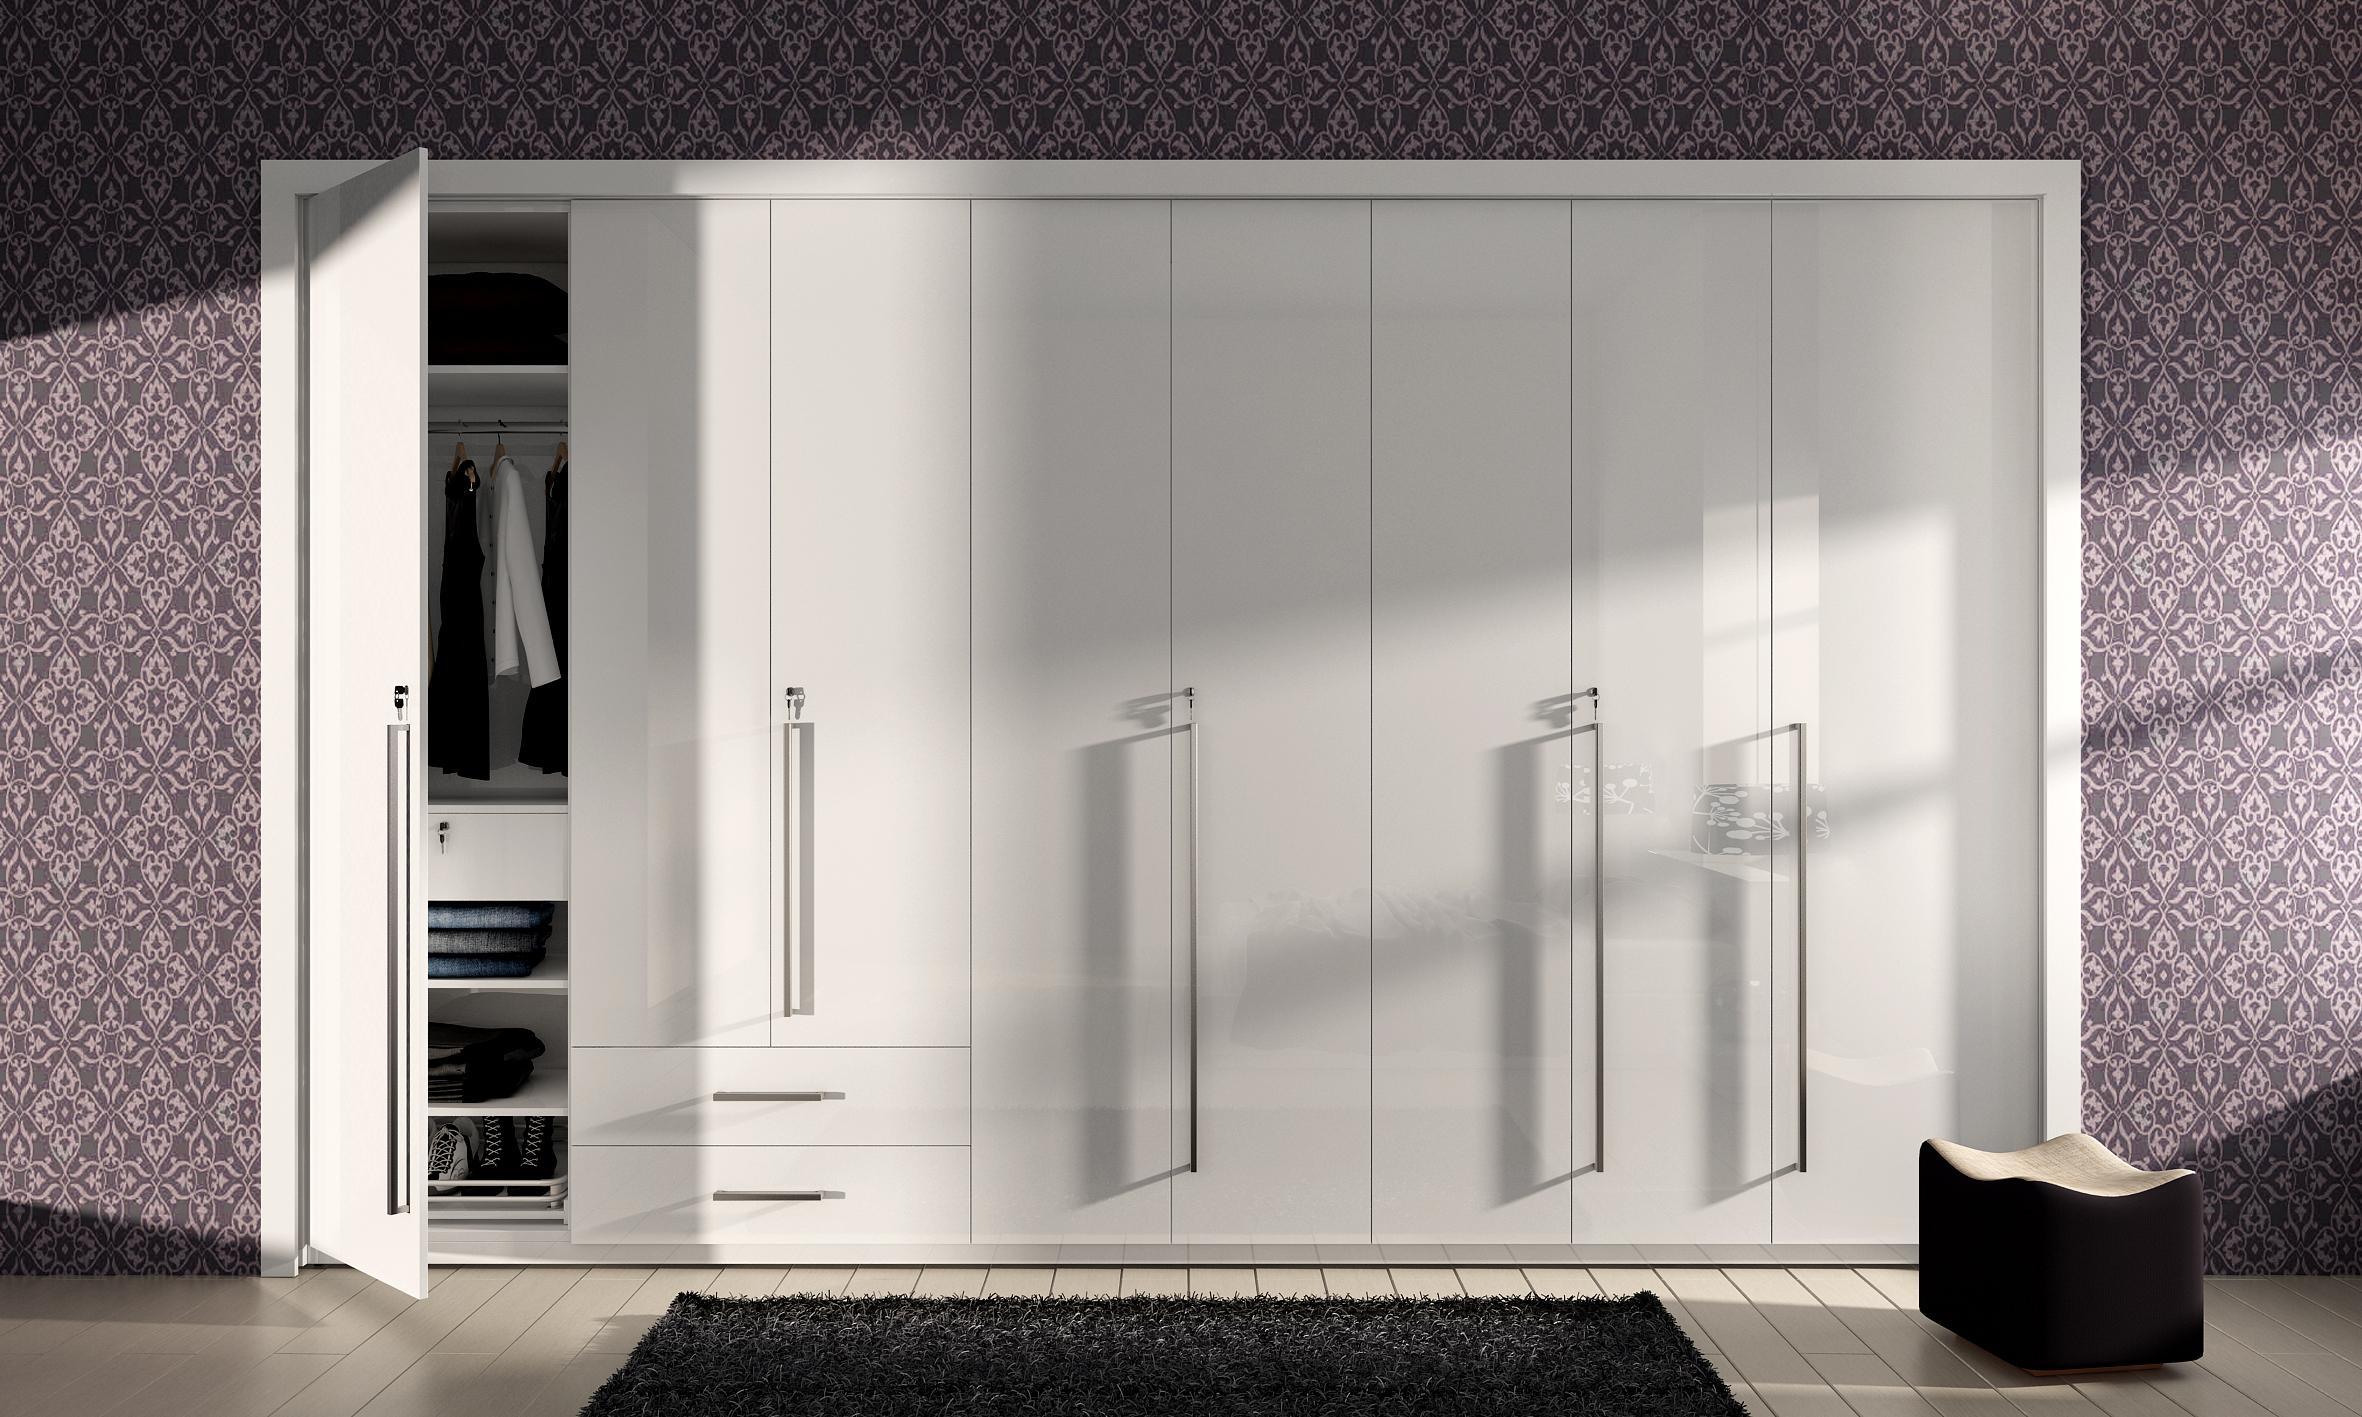 Index of images kitchen wardrobe images for Kitchen wardrobe